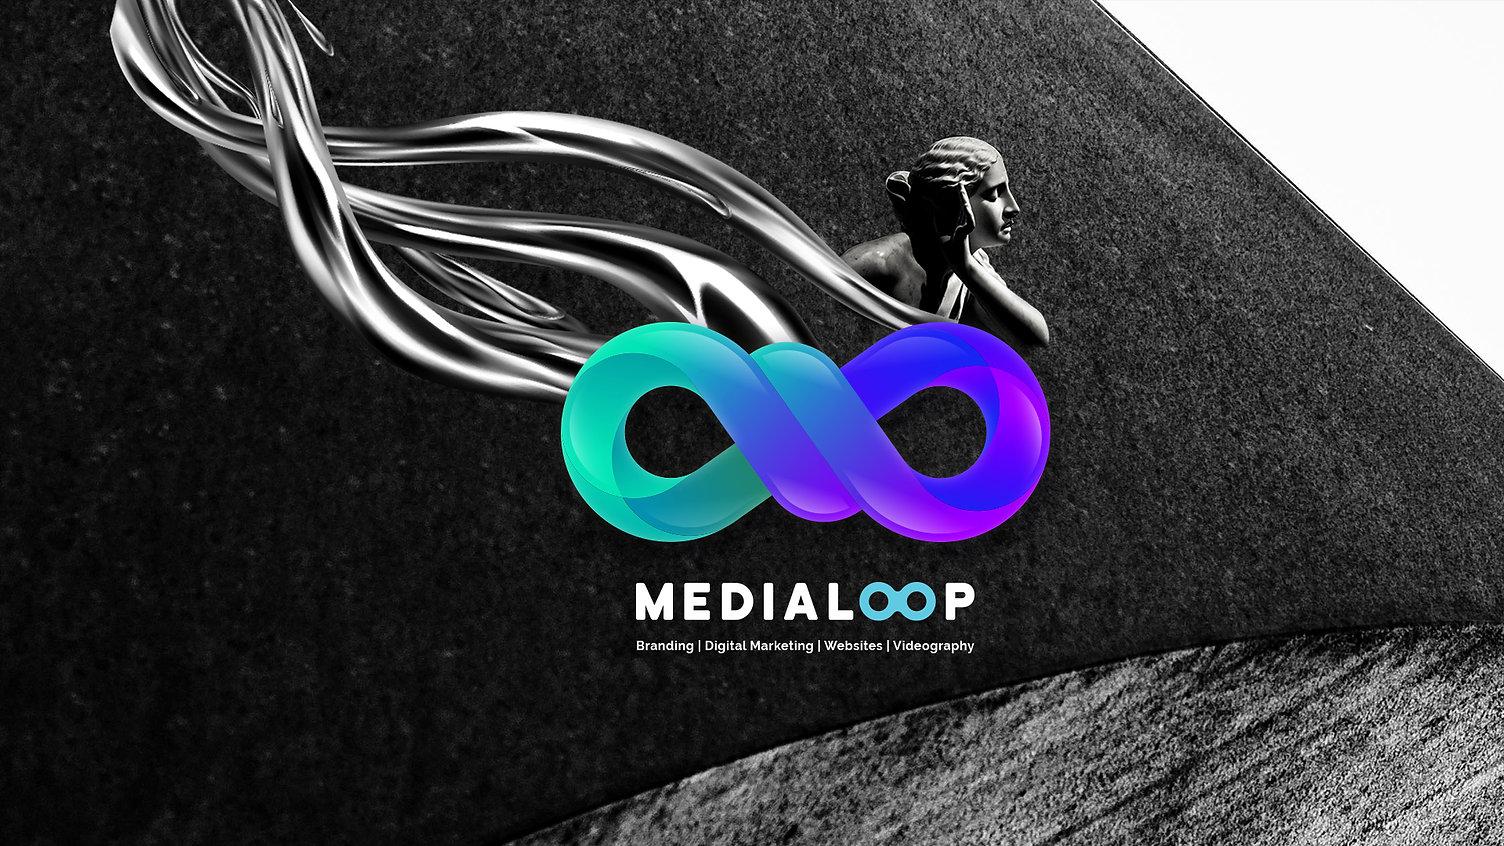 1920x1080_Medialoop website Landing Scre